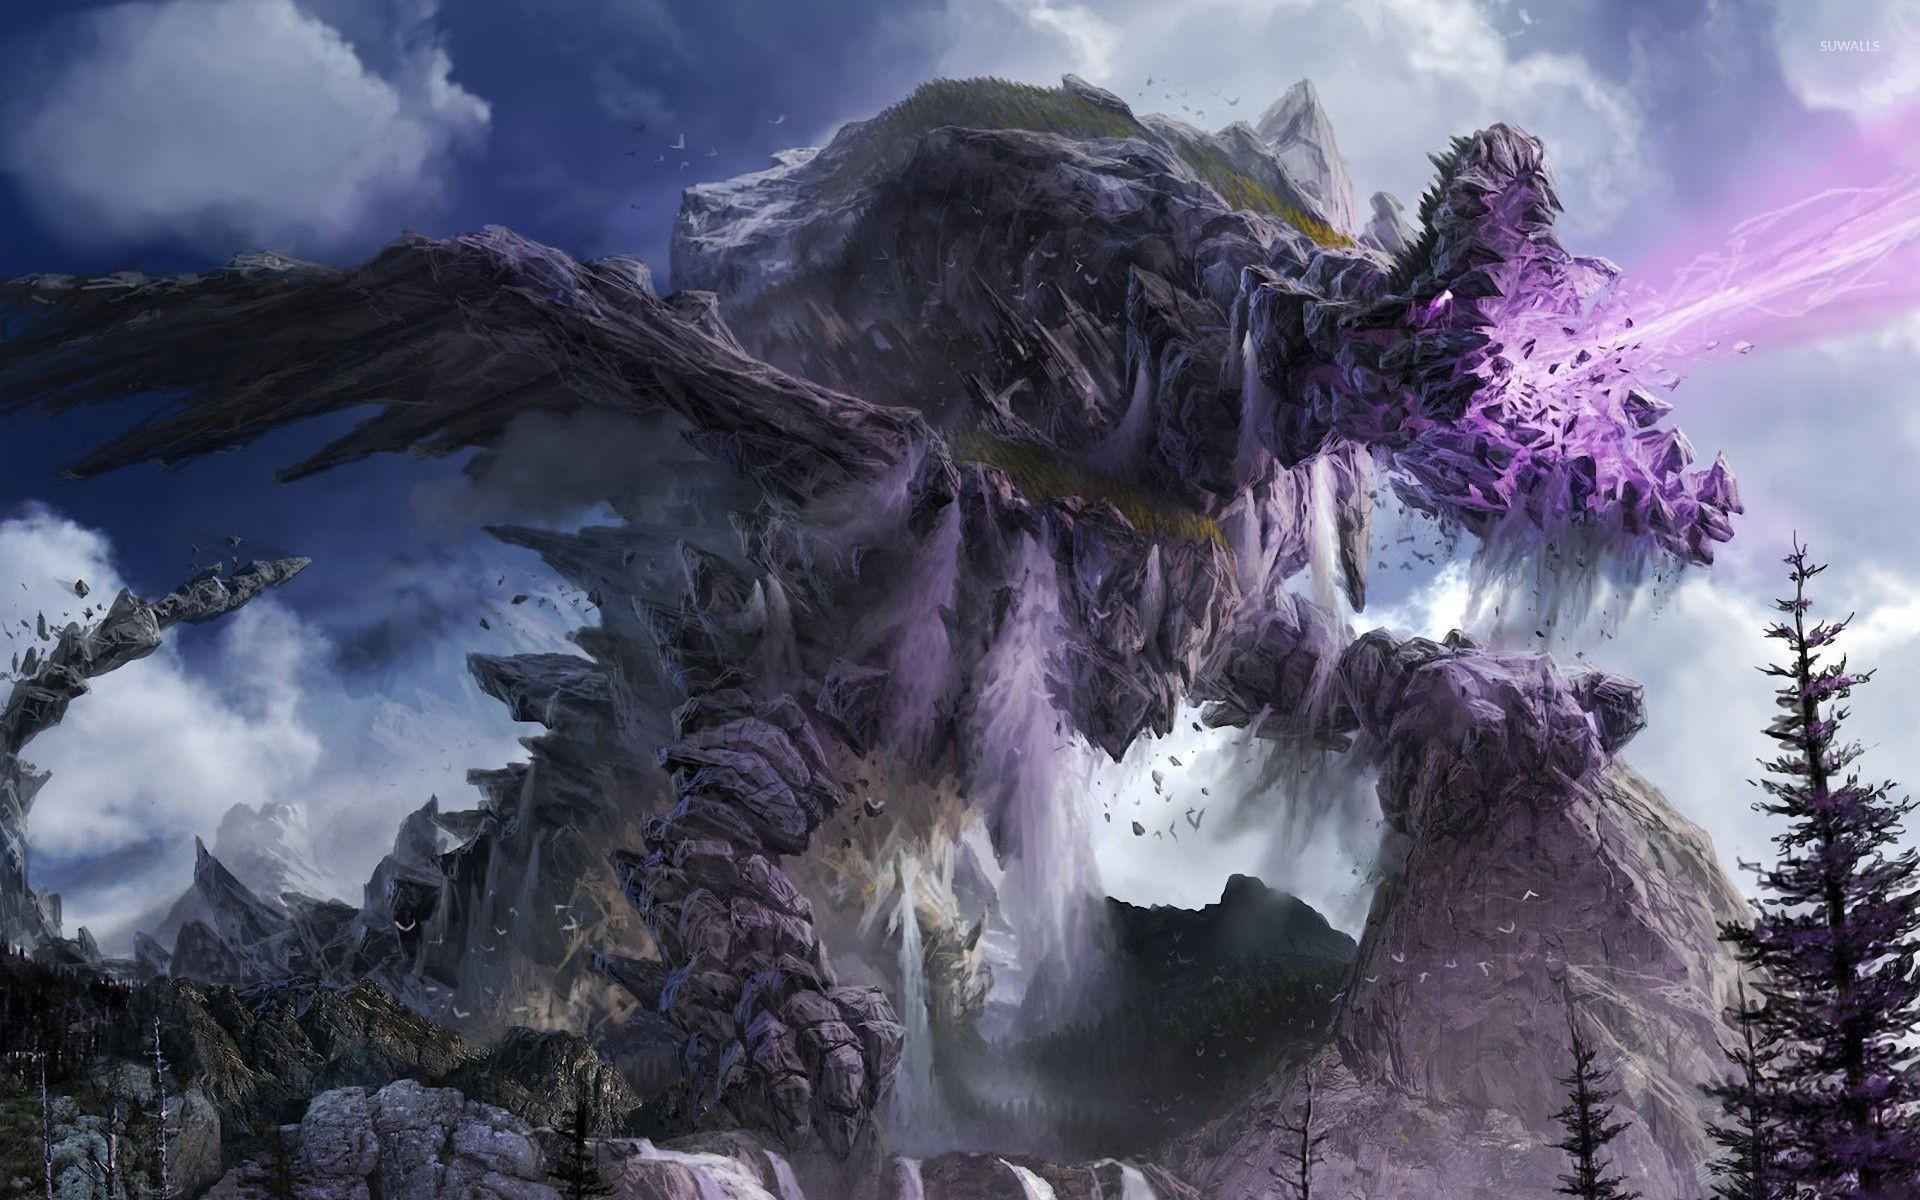 Stone dragon wallpaper jpg